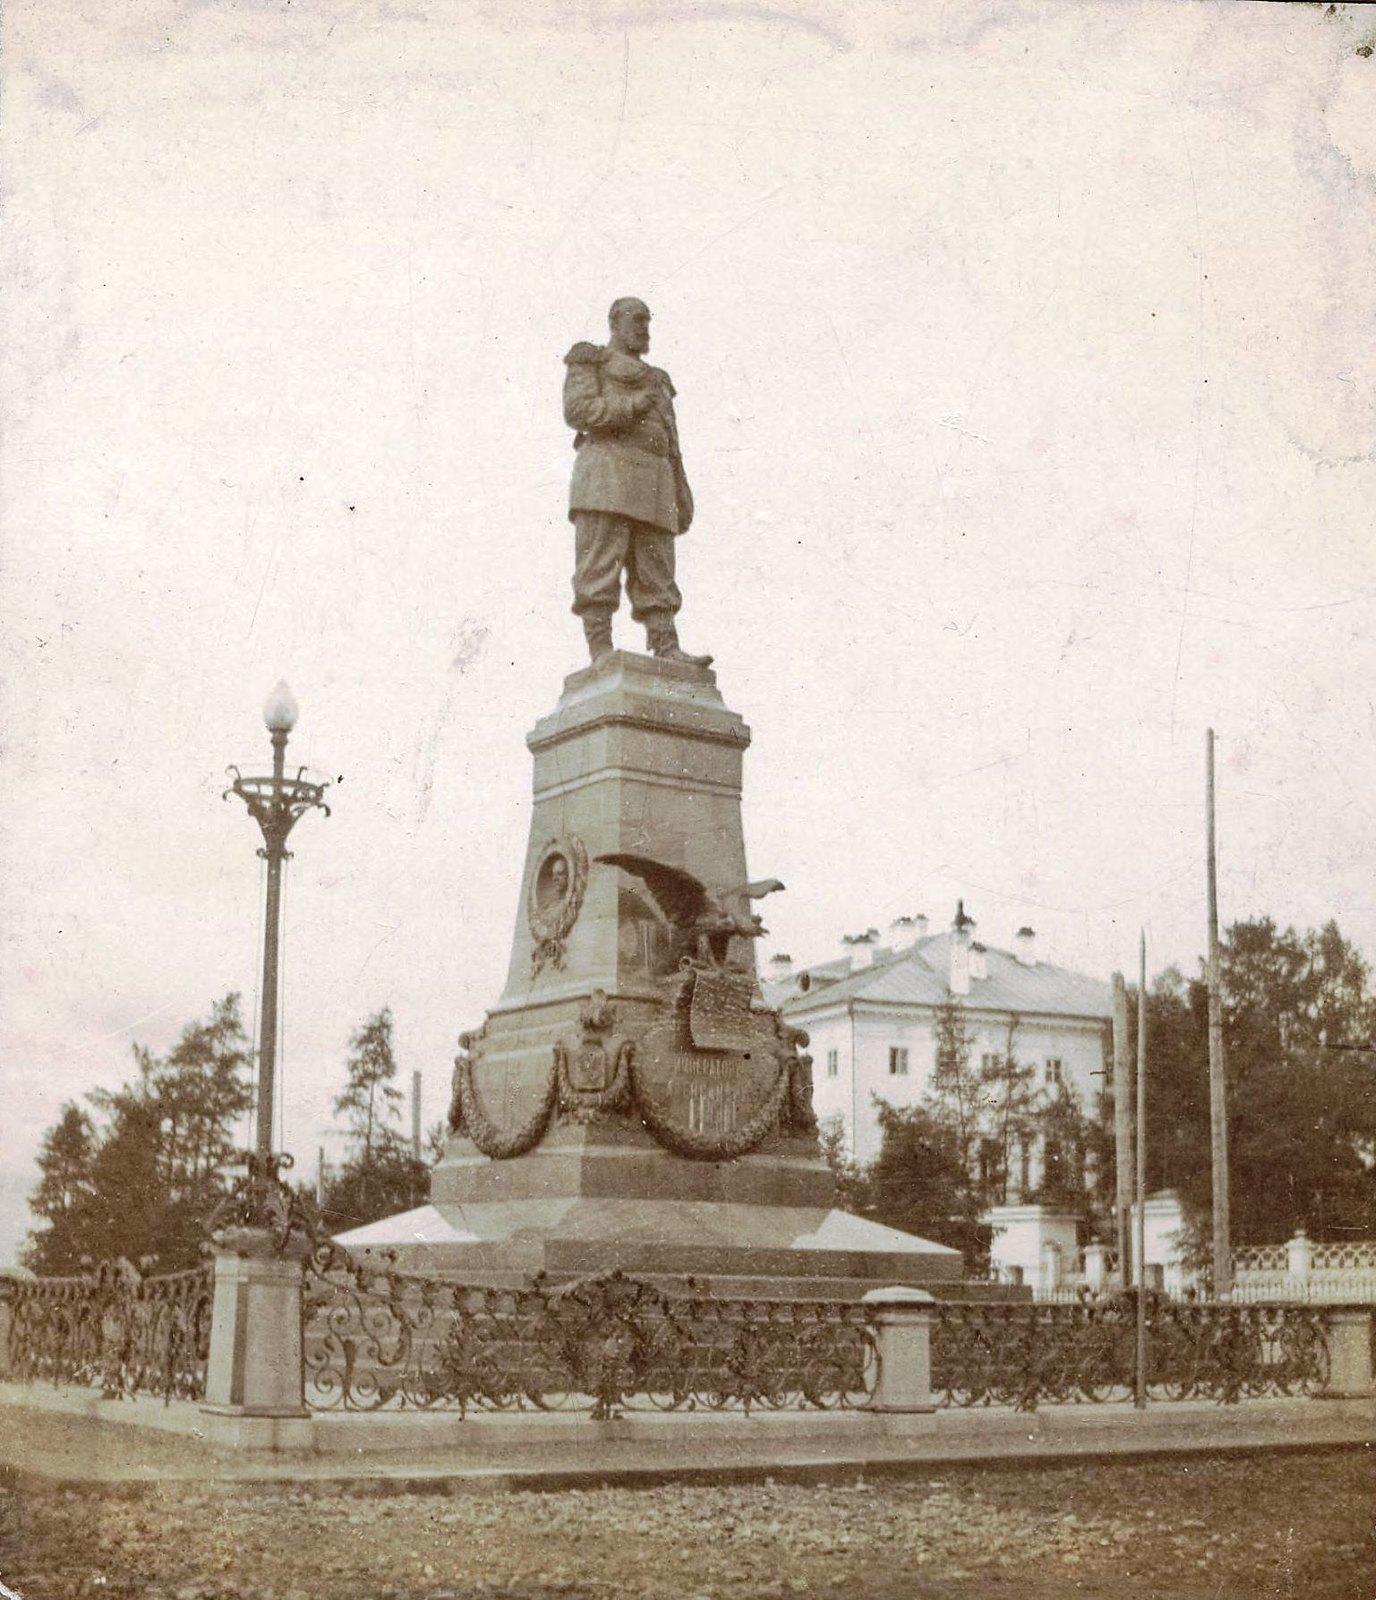 05. Набережная. Памятник Александру III. 20 августа 1911